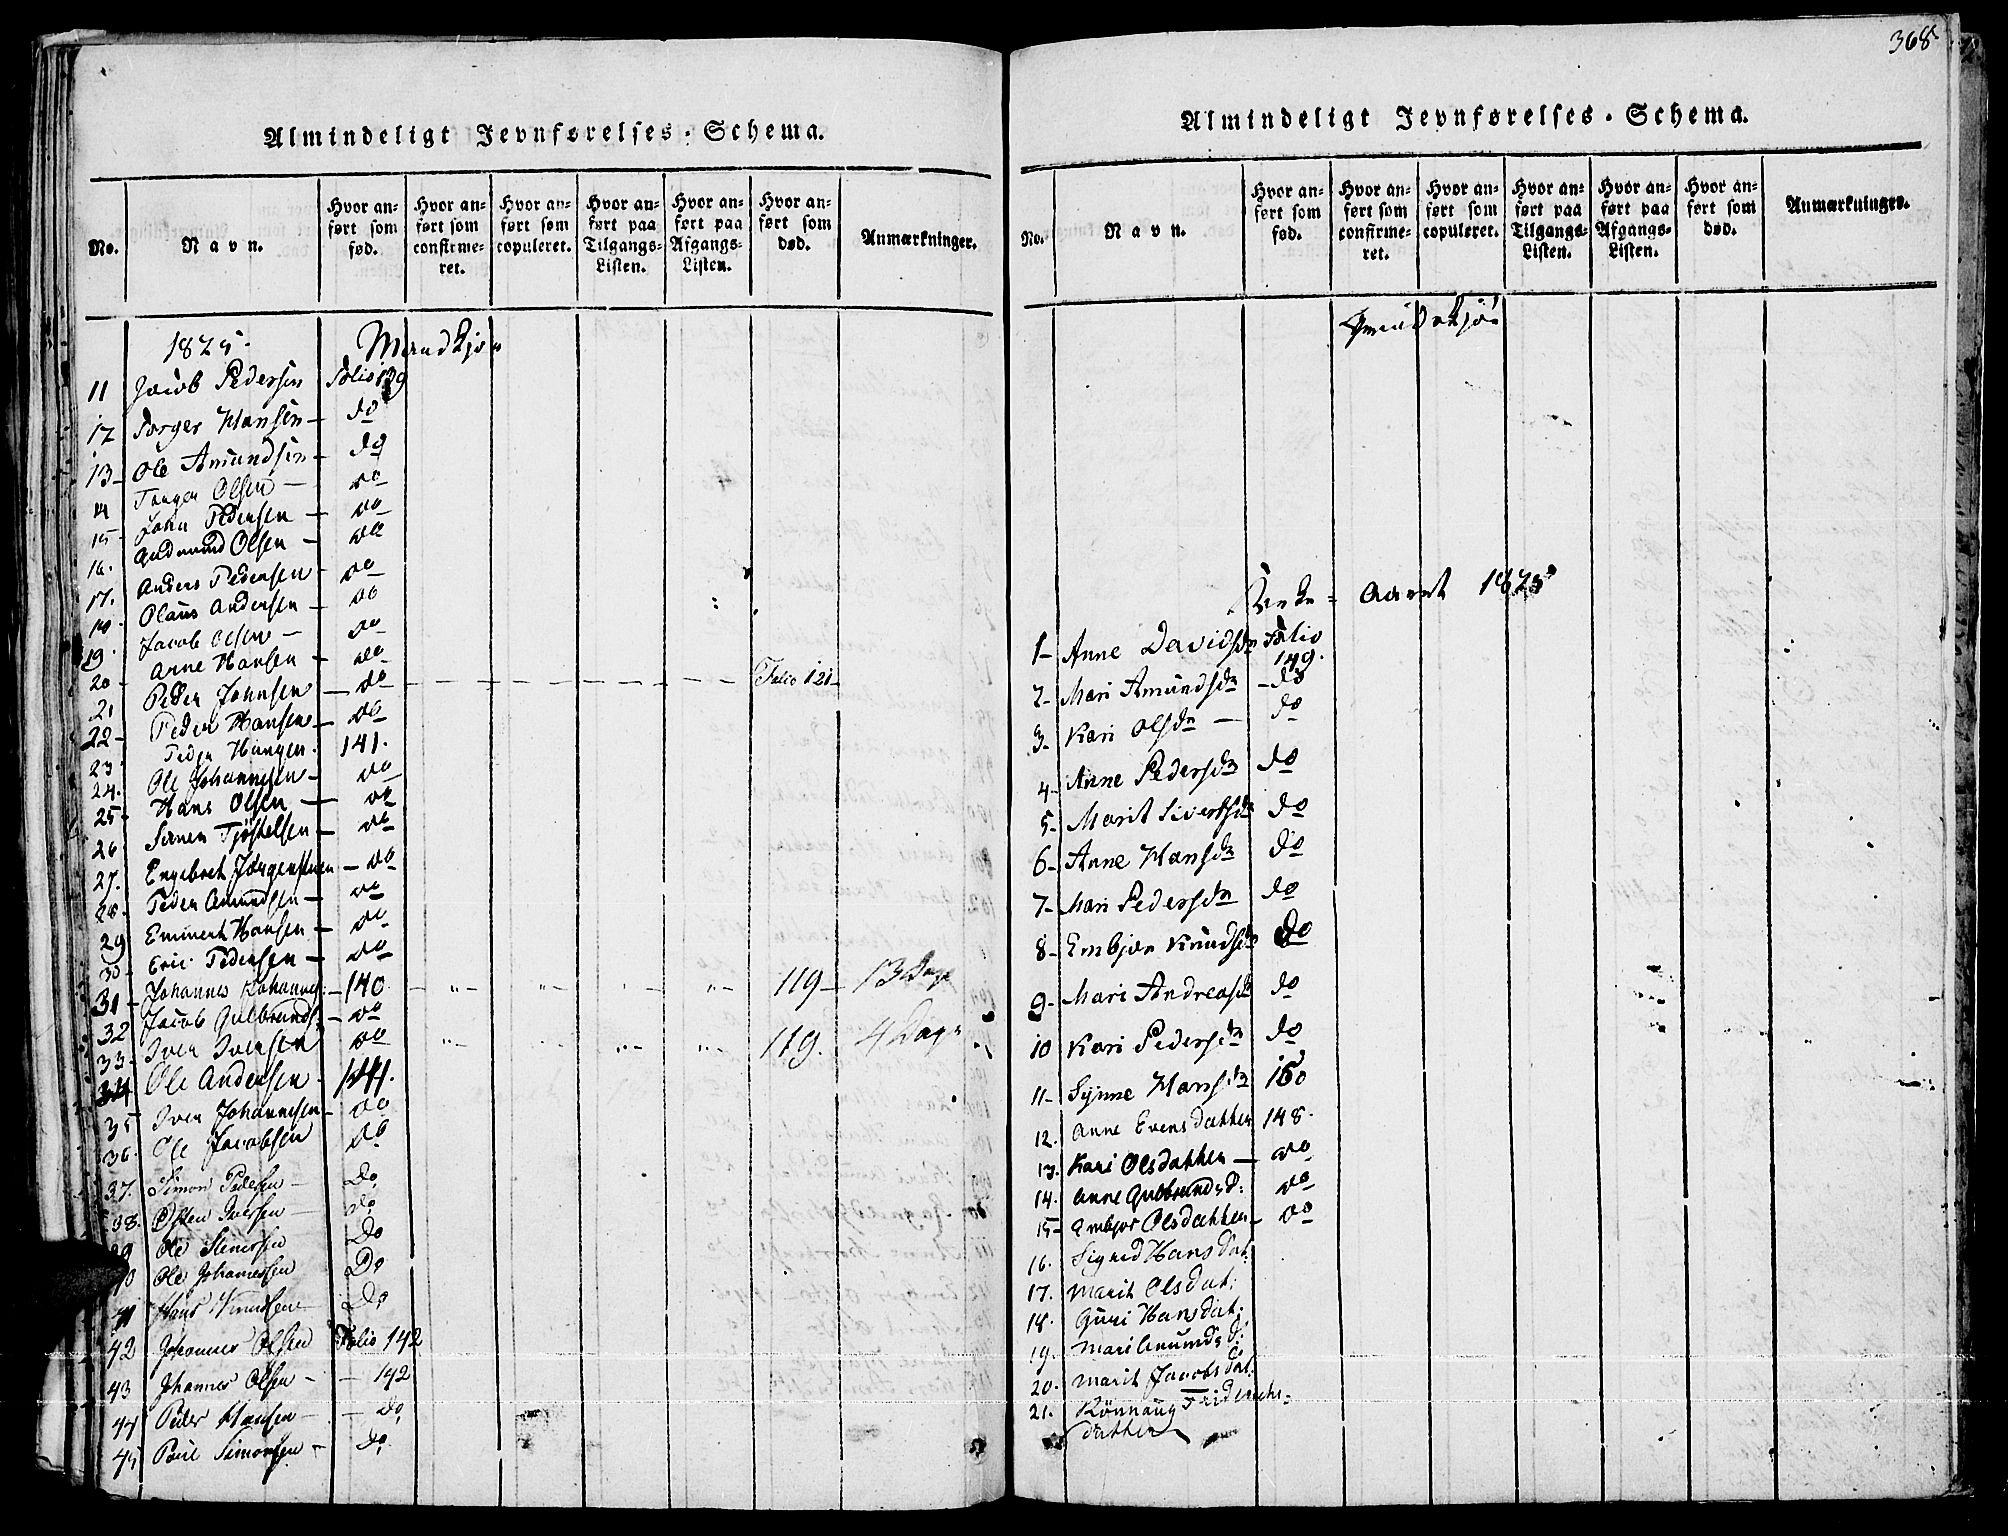 SAH, Fron prestekontor, H/Ha/Haa/L0002: Ministerialbok nr. 2, 1816-1827, s. 368